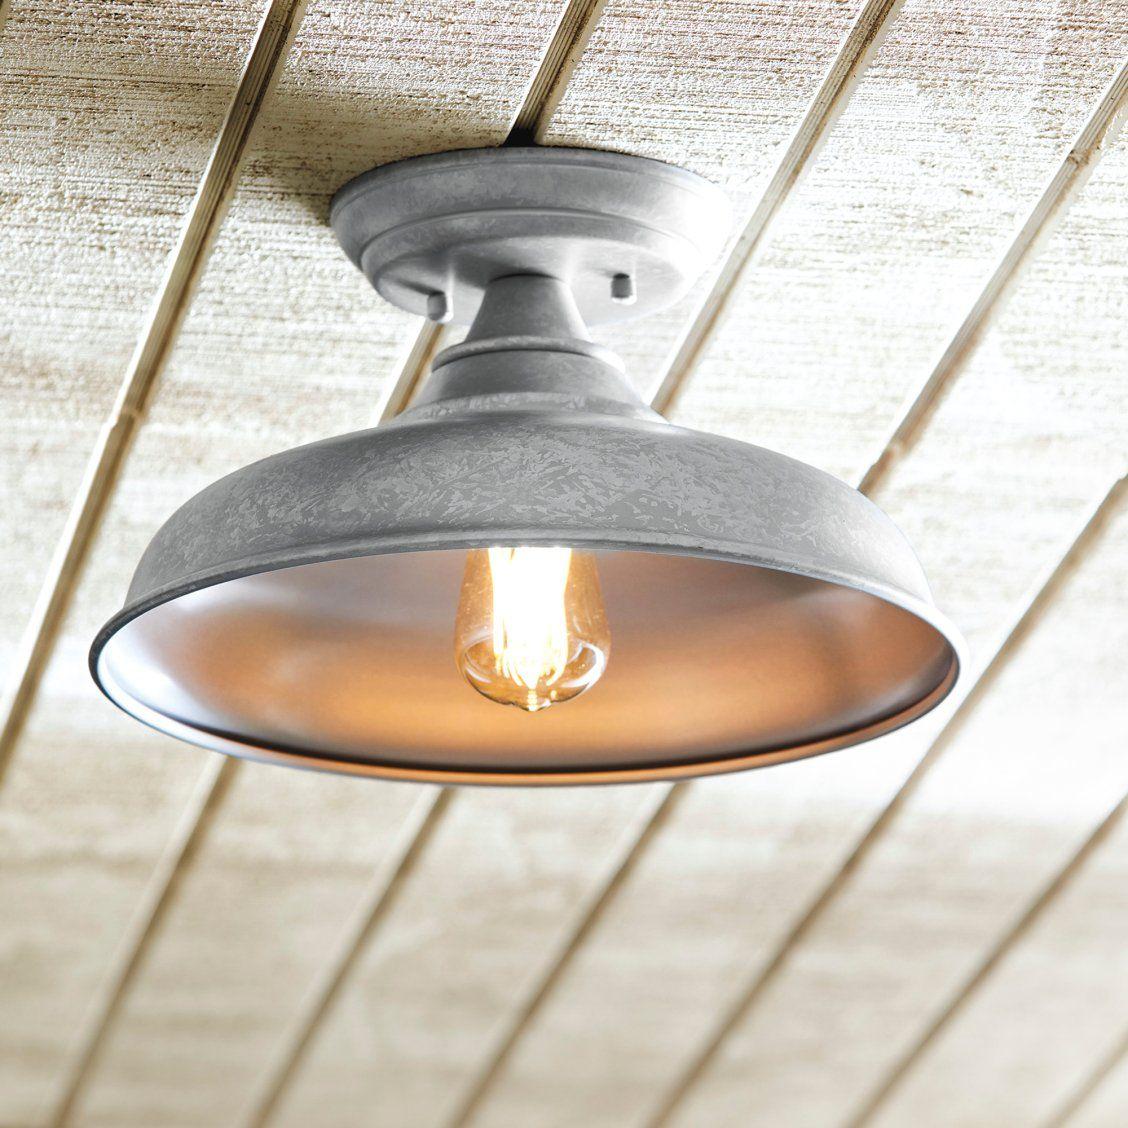 Archer Industrial Outdoor Ceiling Mount Light Fixture Ceiling Mount Light Fixtures Industrial Light Fixtures Industrial Ceiling Lights